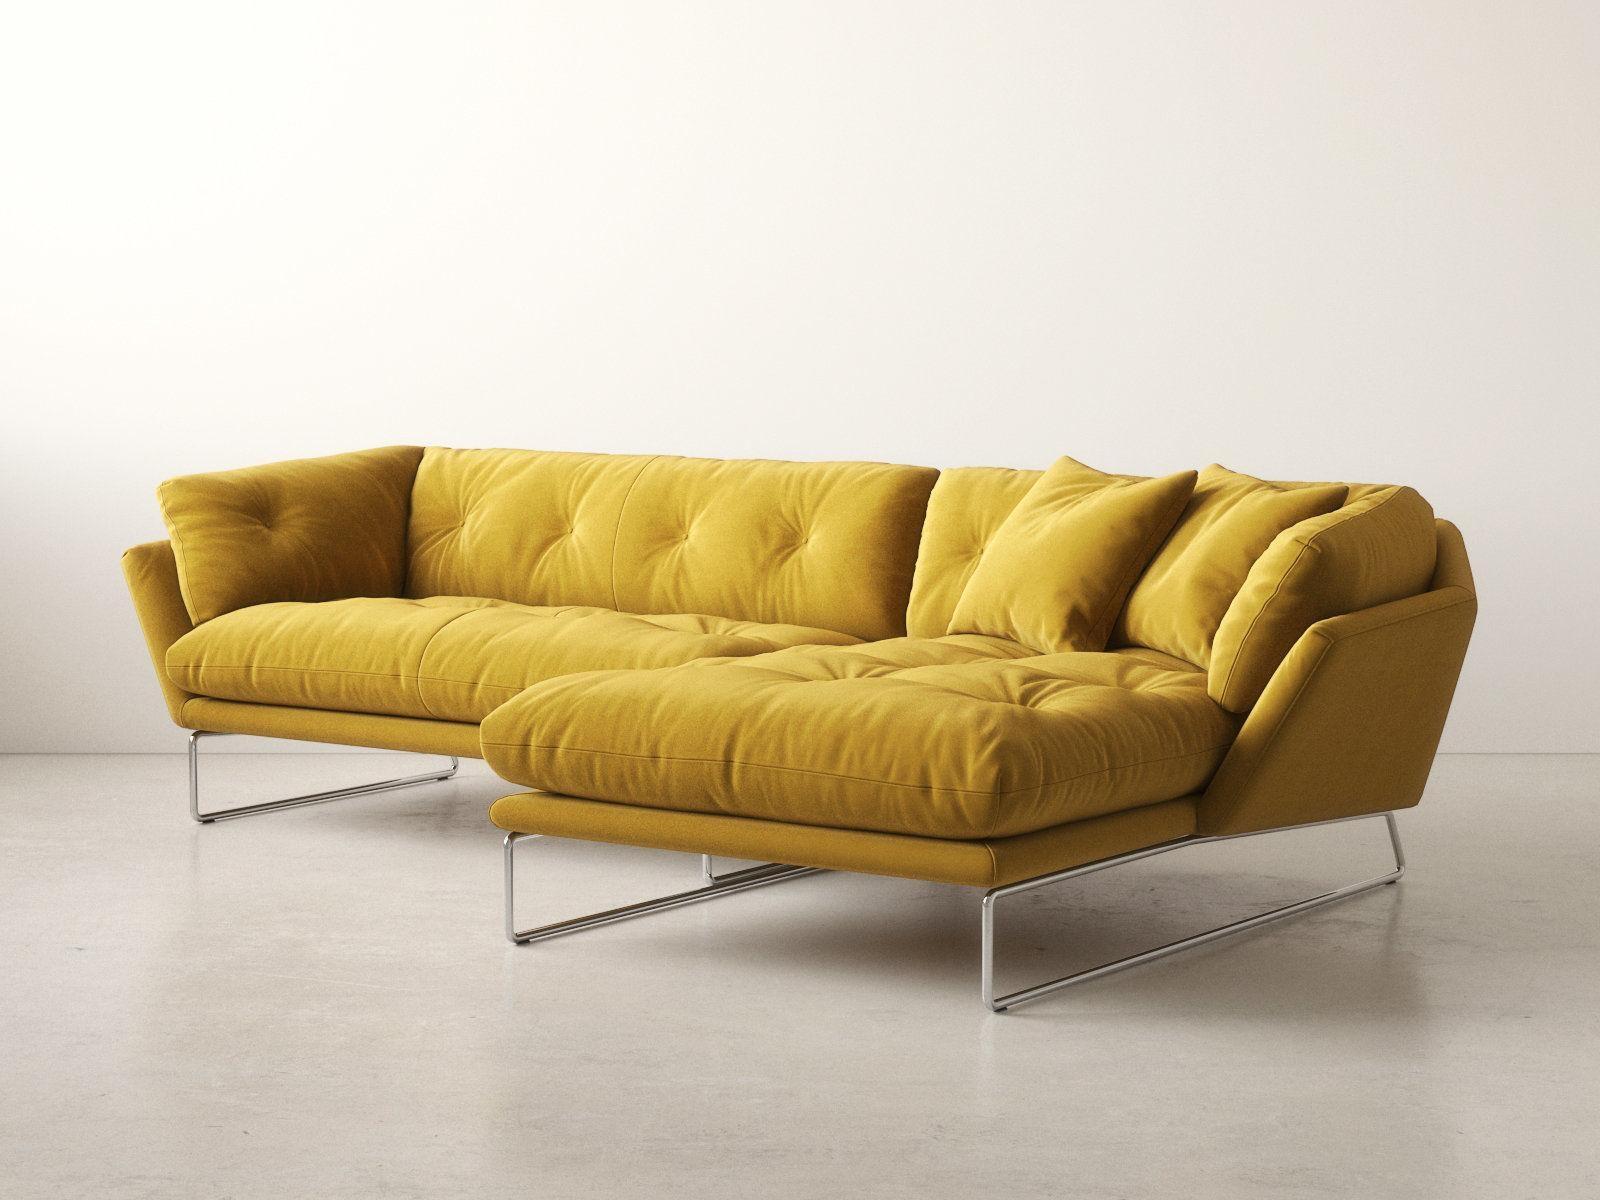 Low Height Sofas on Luxury Living Room Set